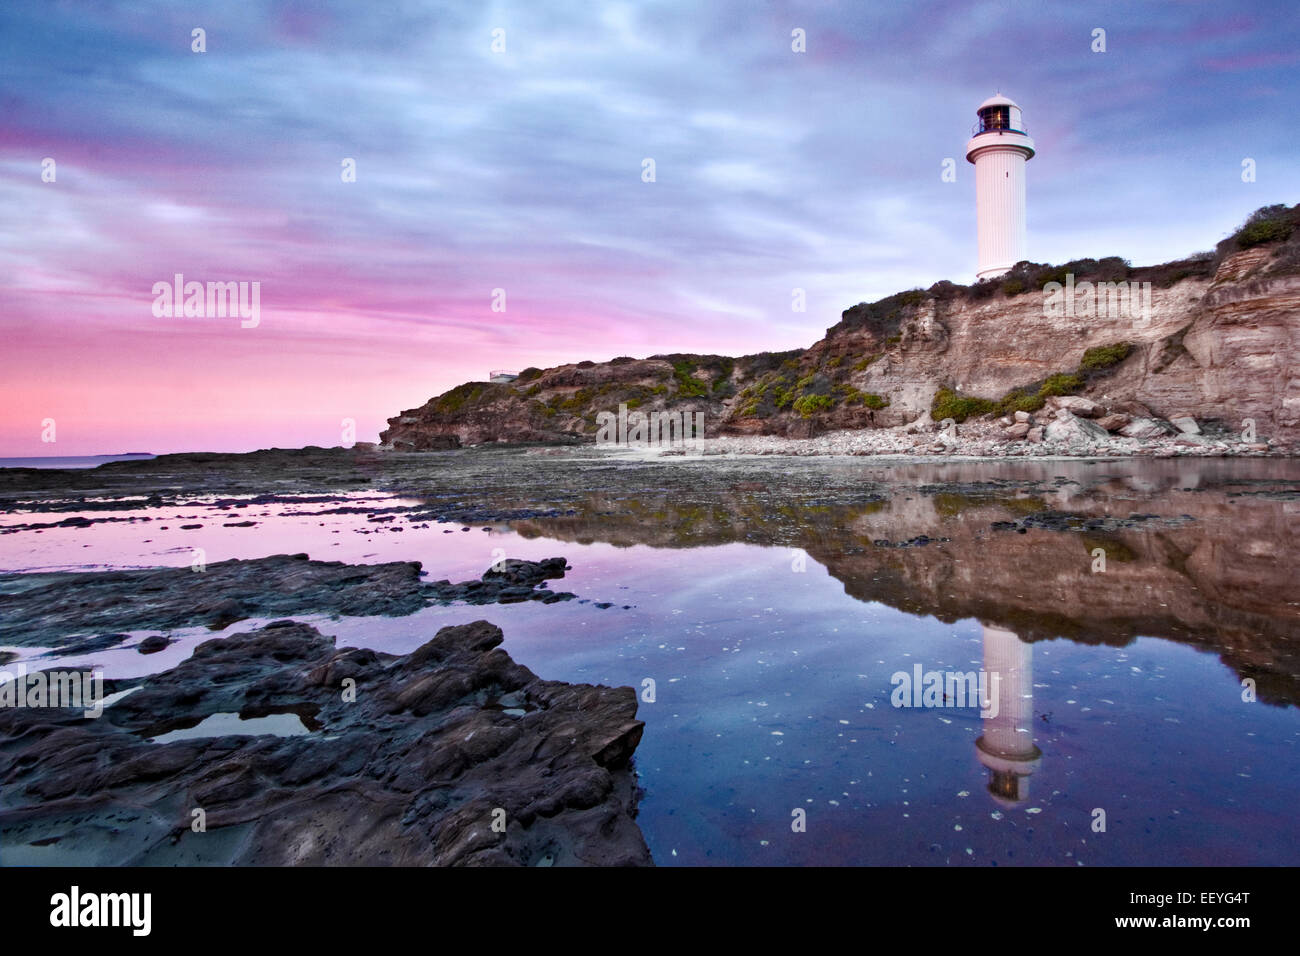 Australischen Küsten-Szene Stockbild